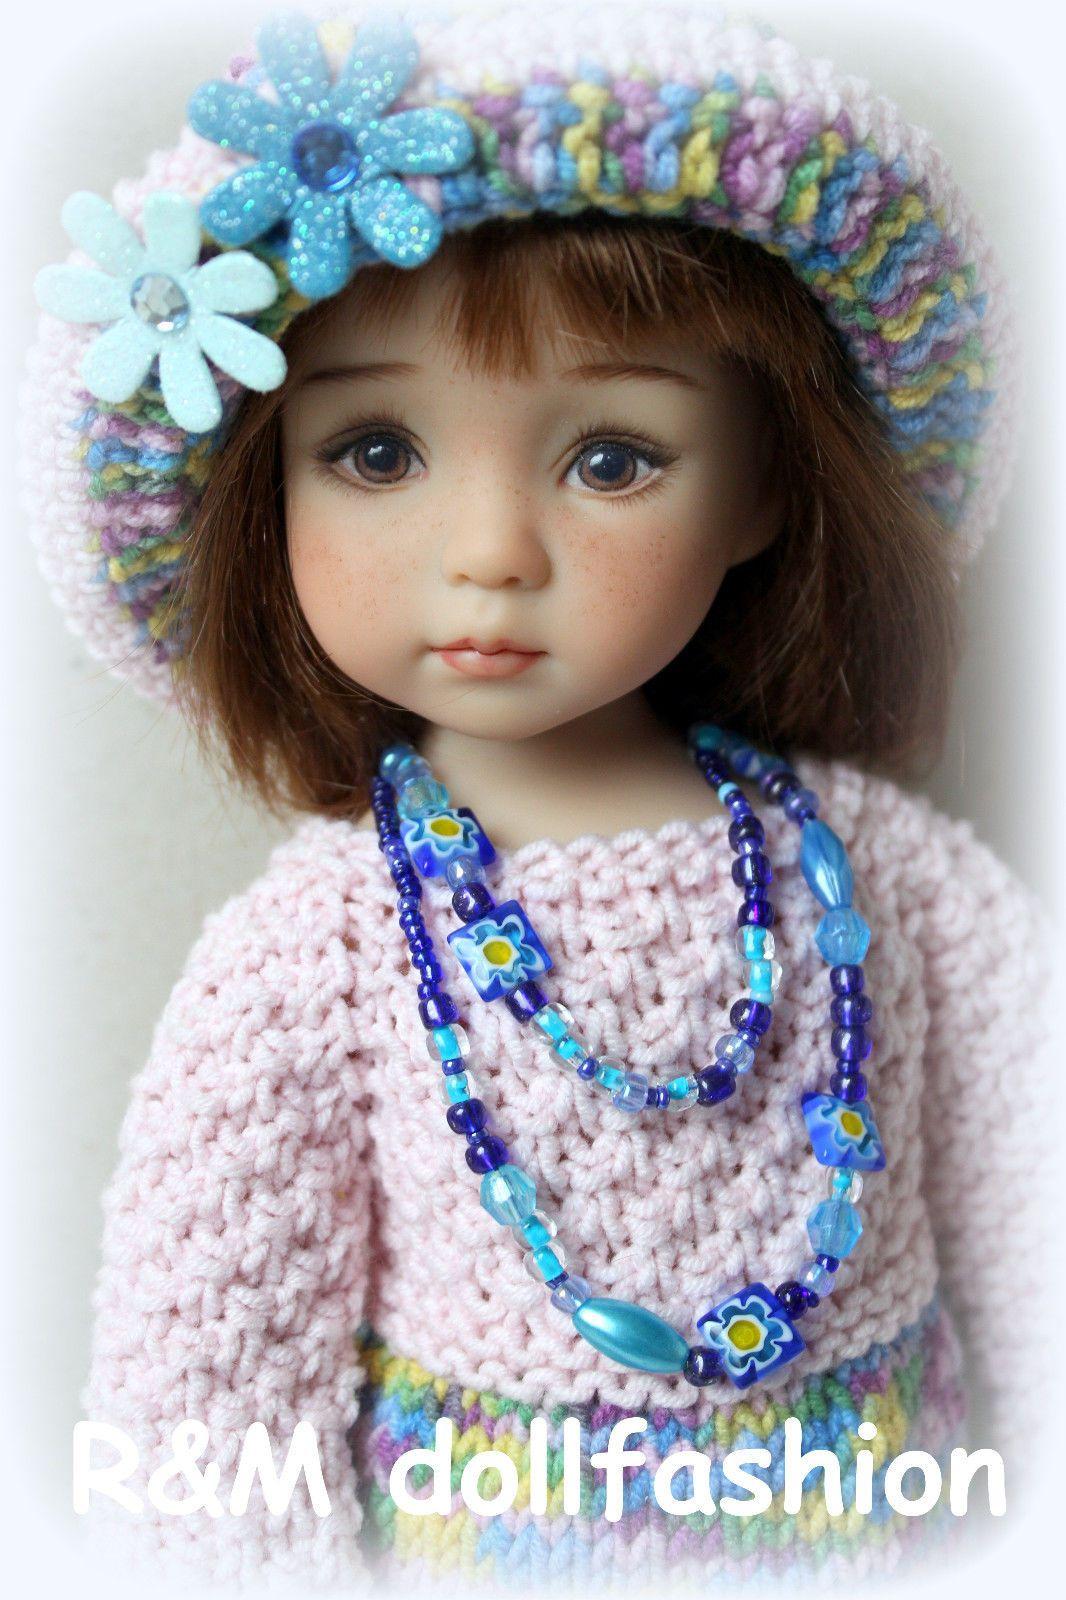 "R M Dollfashion Bright Line Handknit Set for Effner Little Darling 13"" Dolls | eBay"